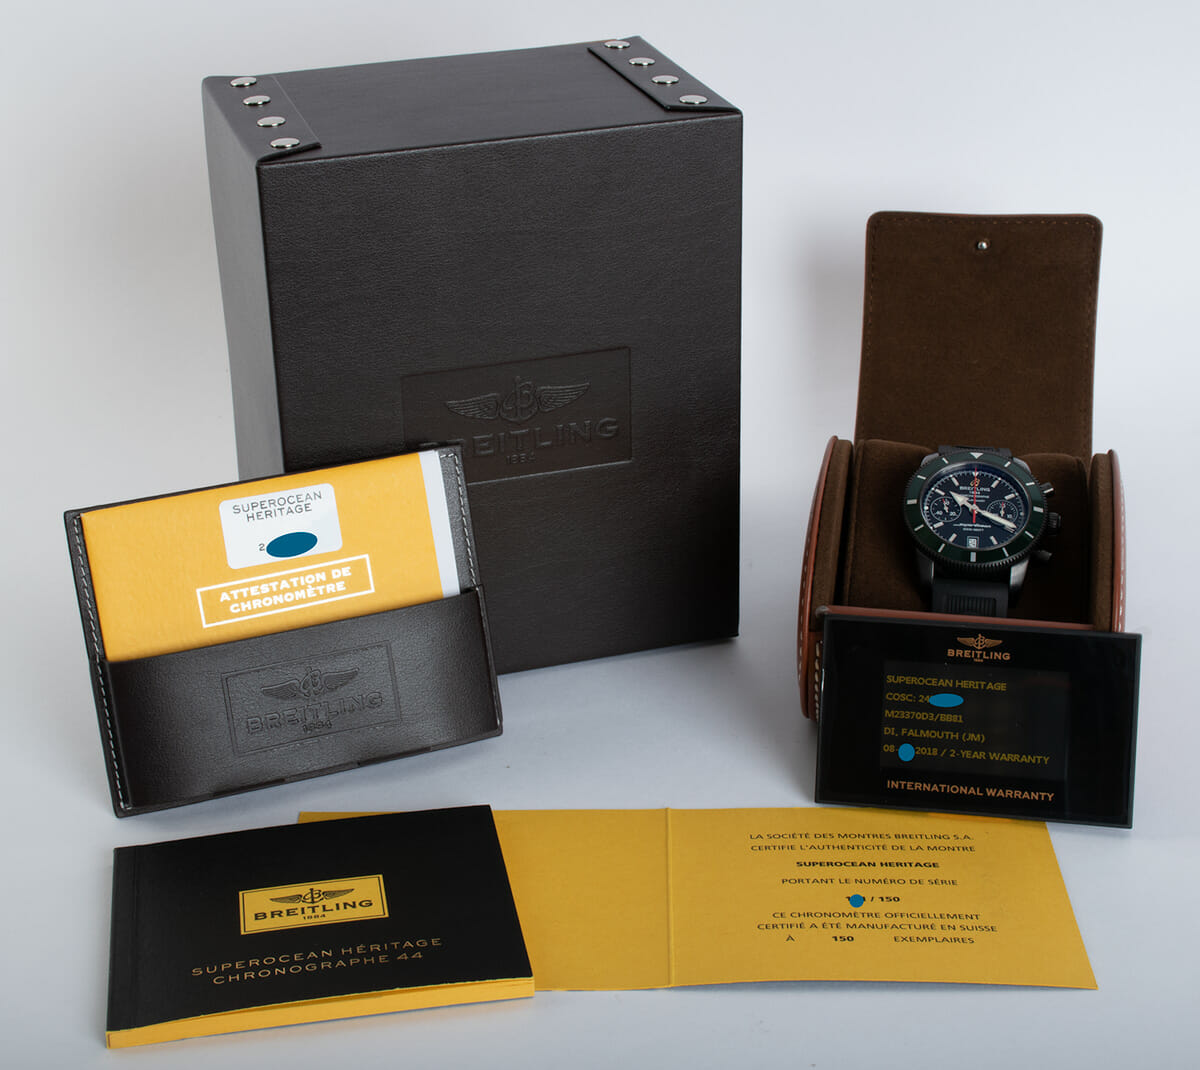 Box / Paper shot of SuperOcean Heritage Chronograph 44 BlackSteel